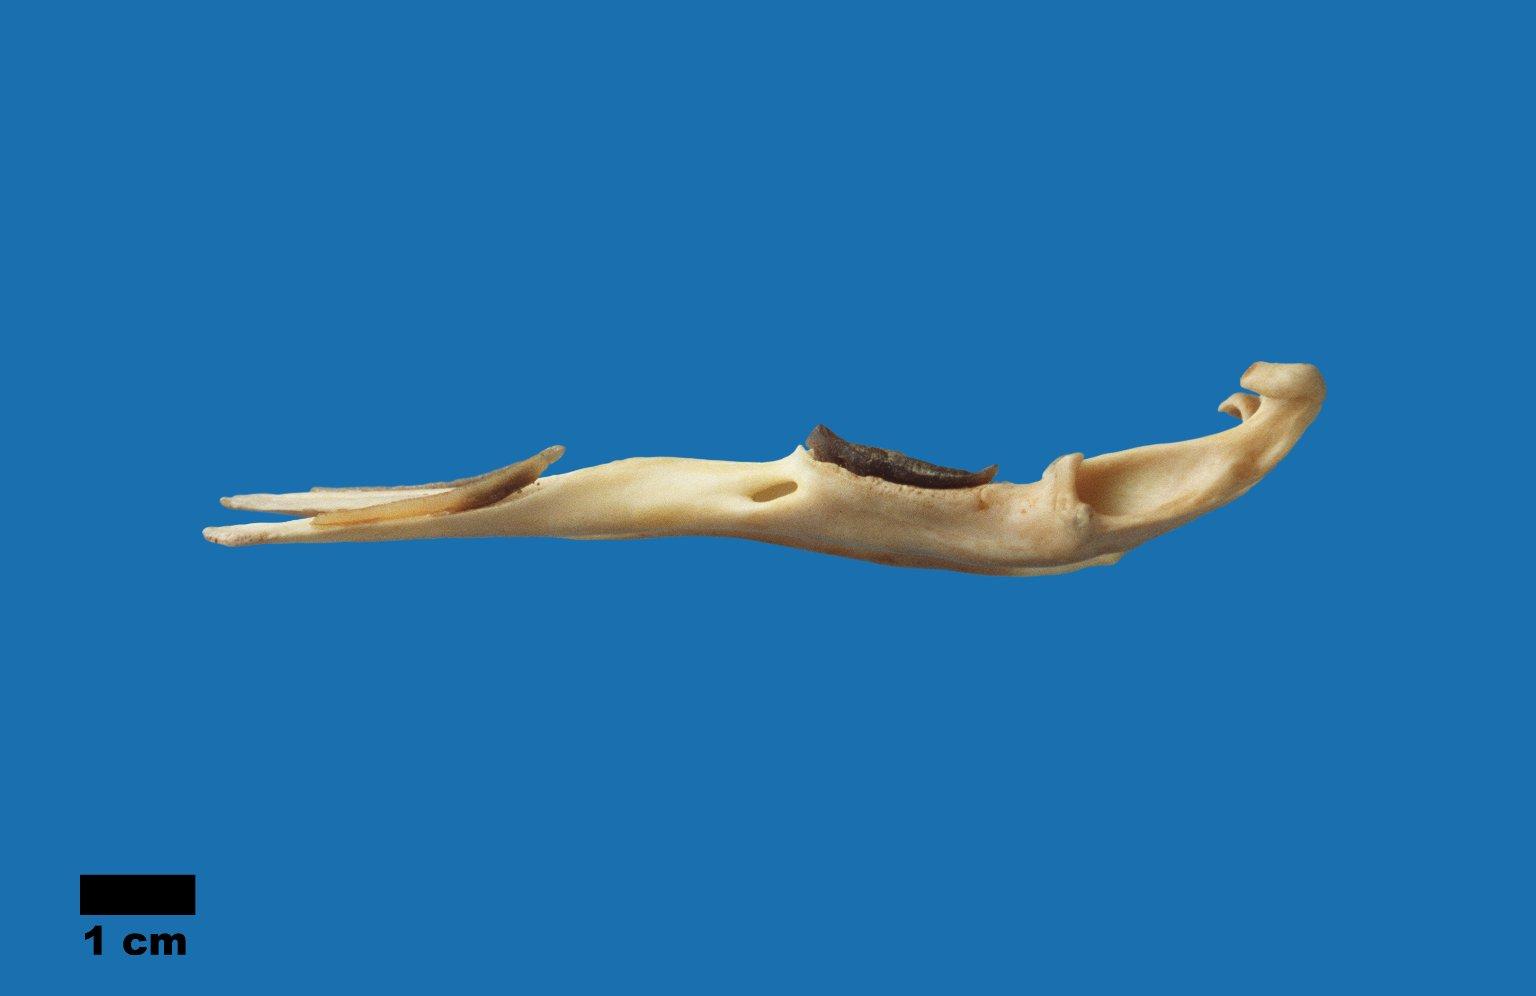 Ornithorhynchus anatinus (Platypus)